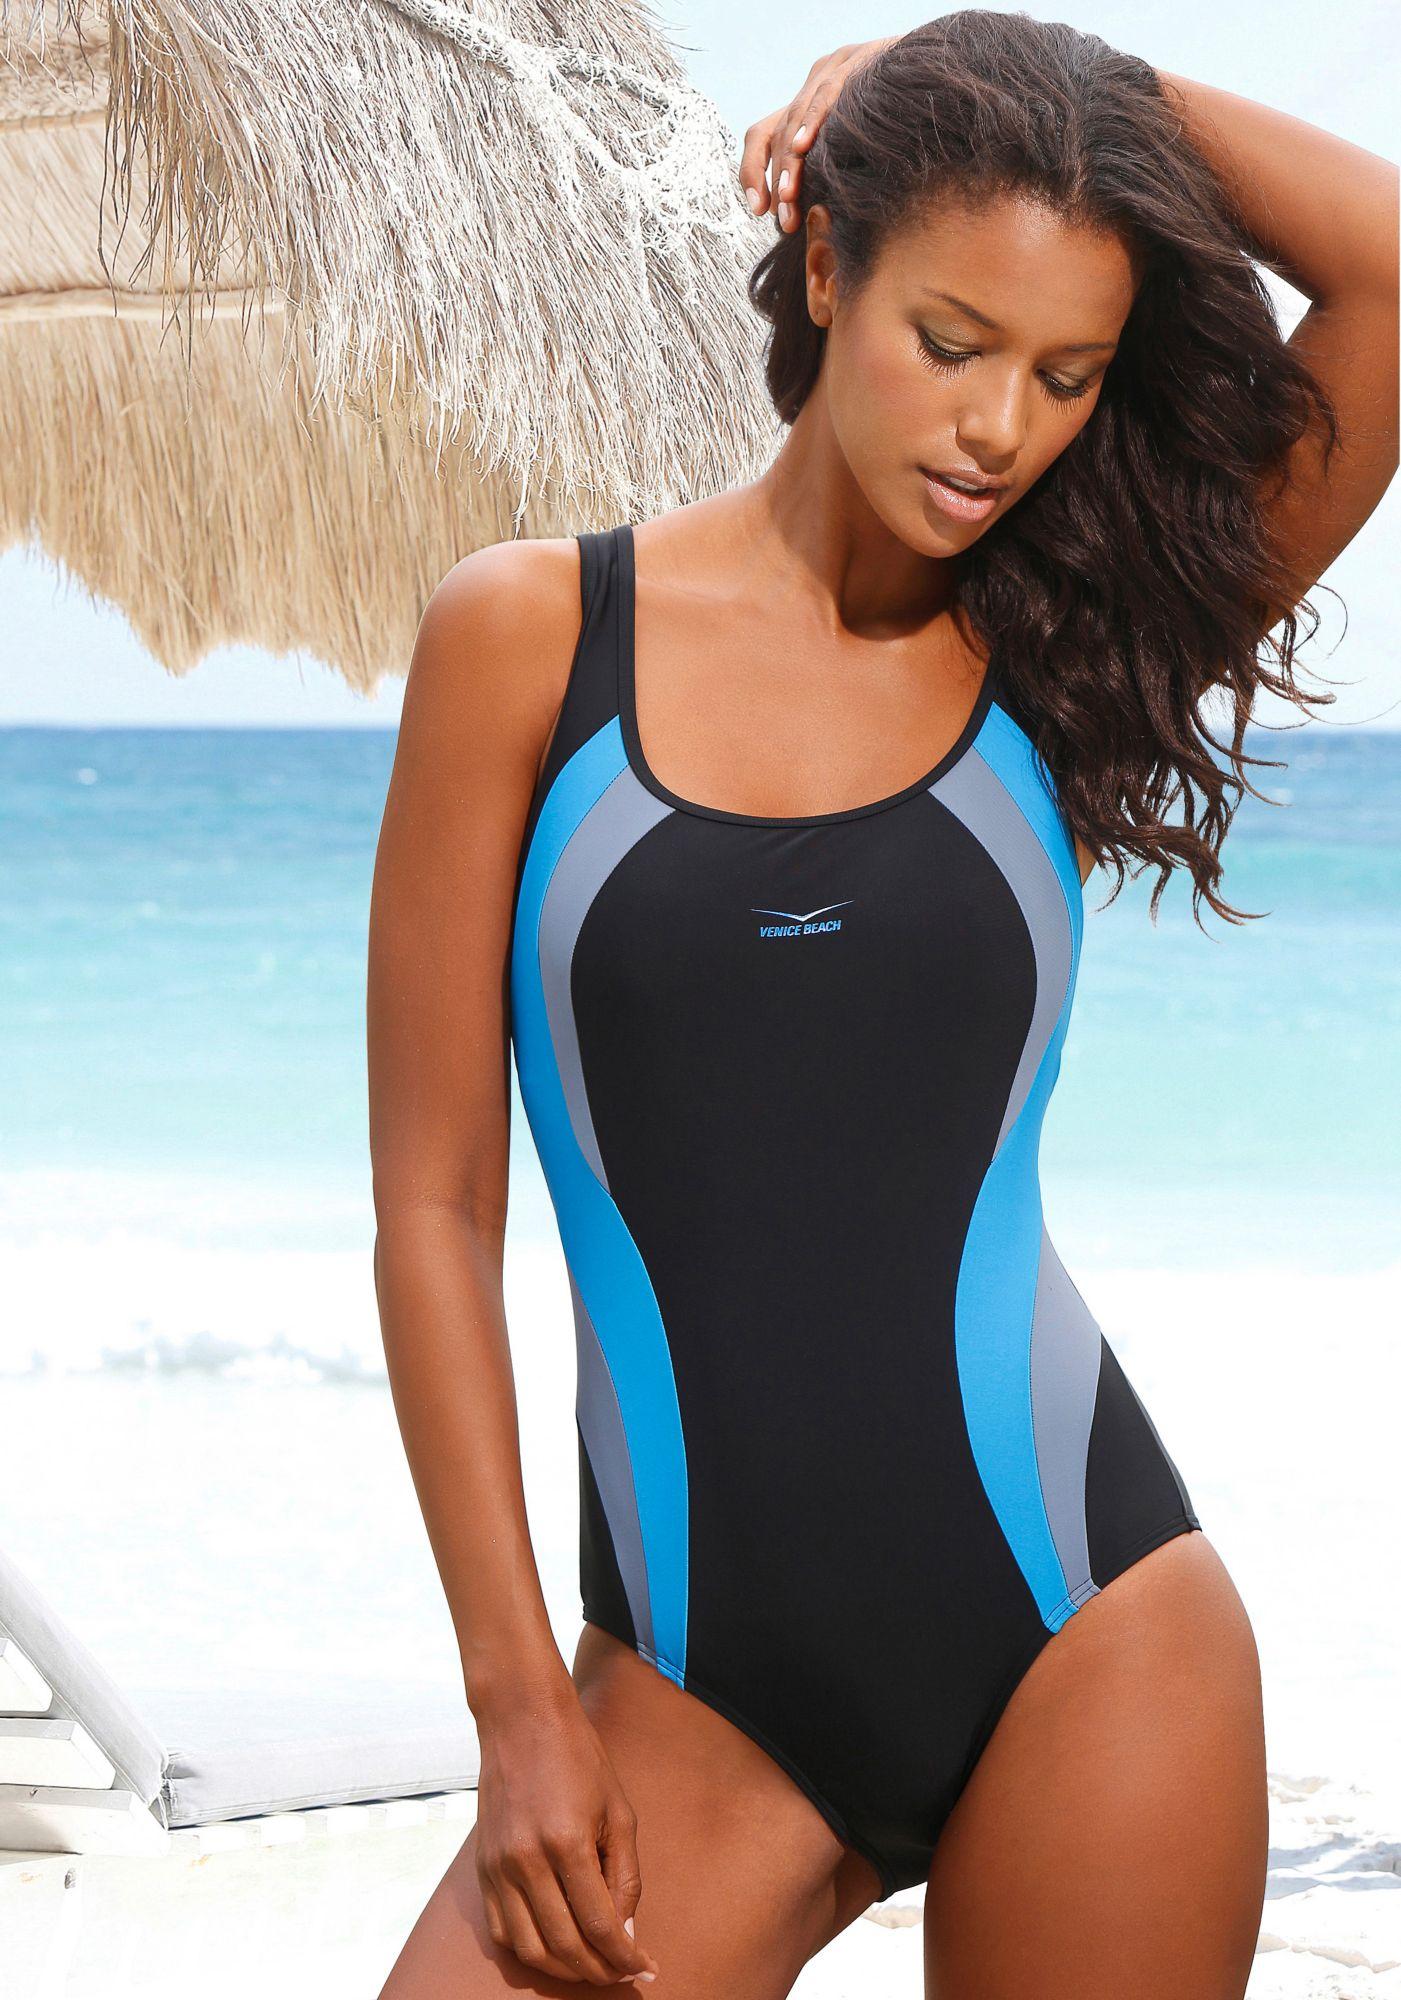 badeanzug venice beach schwab versand runde h ften. Black Bedroom Furniture Sets. Home Design Ideas